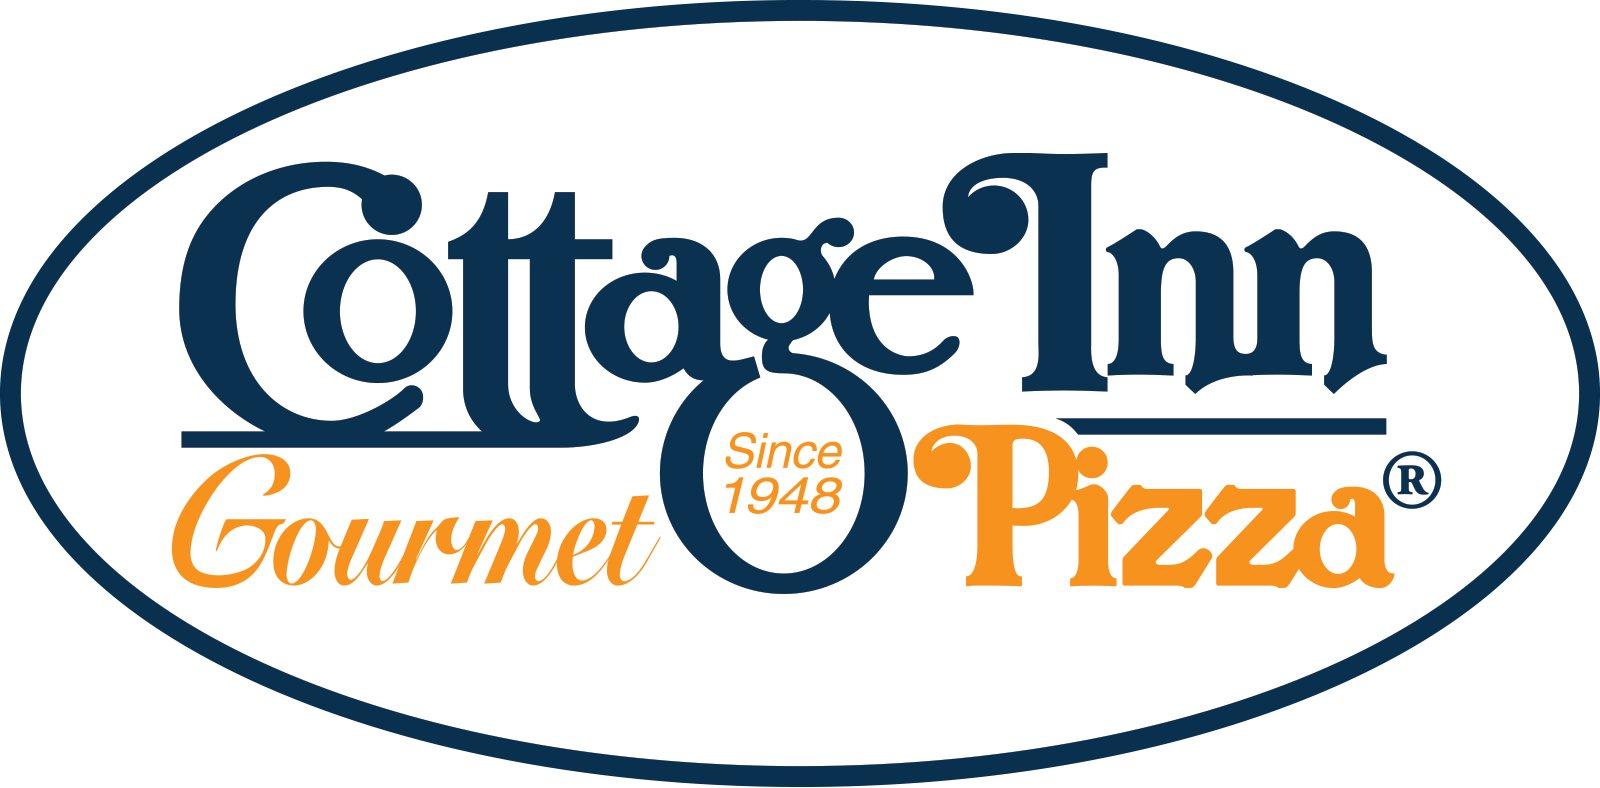 cottage inn pizza 434 s 11th st niles mi 49120 yp com